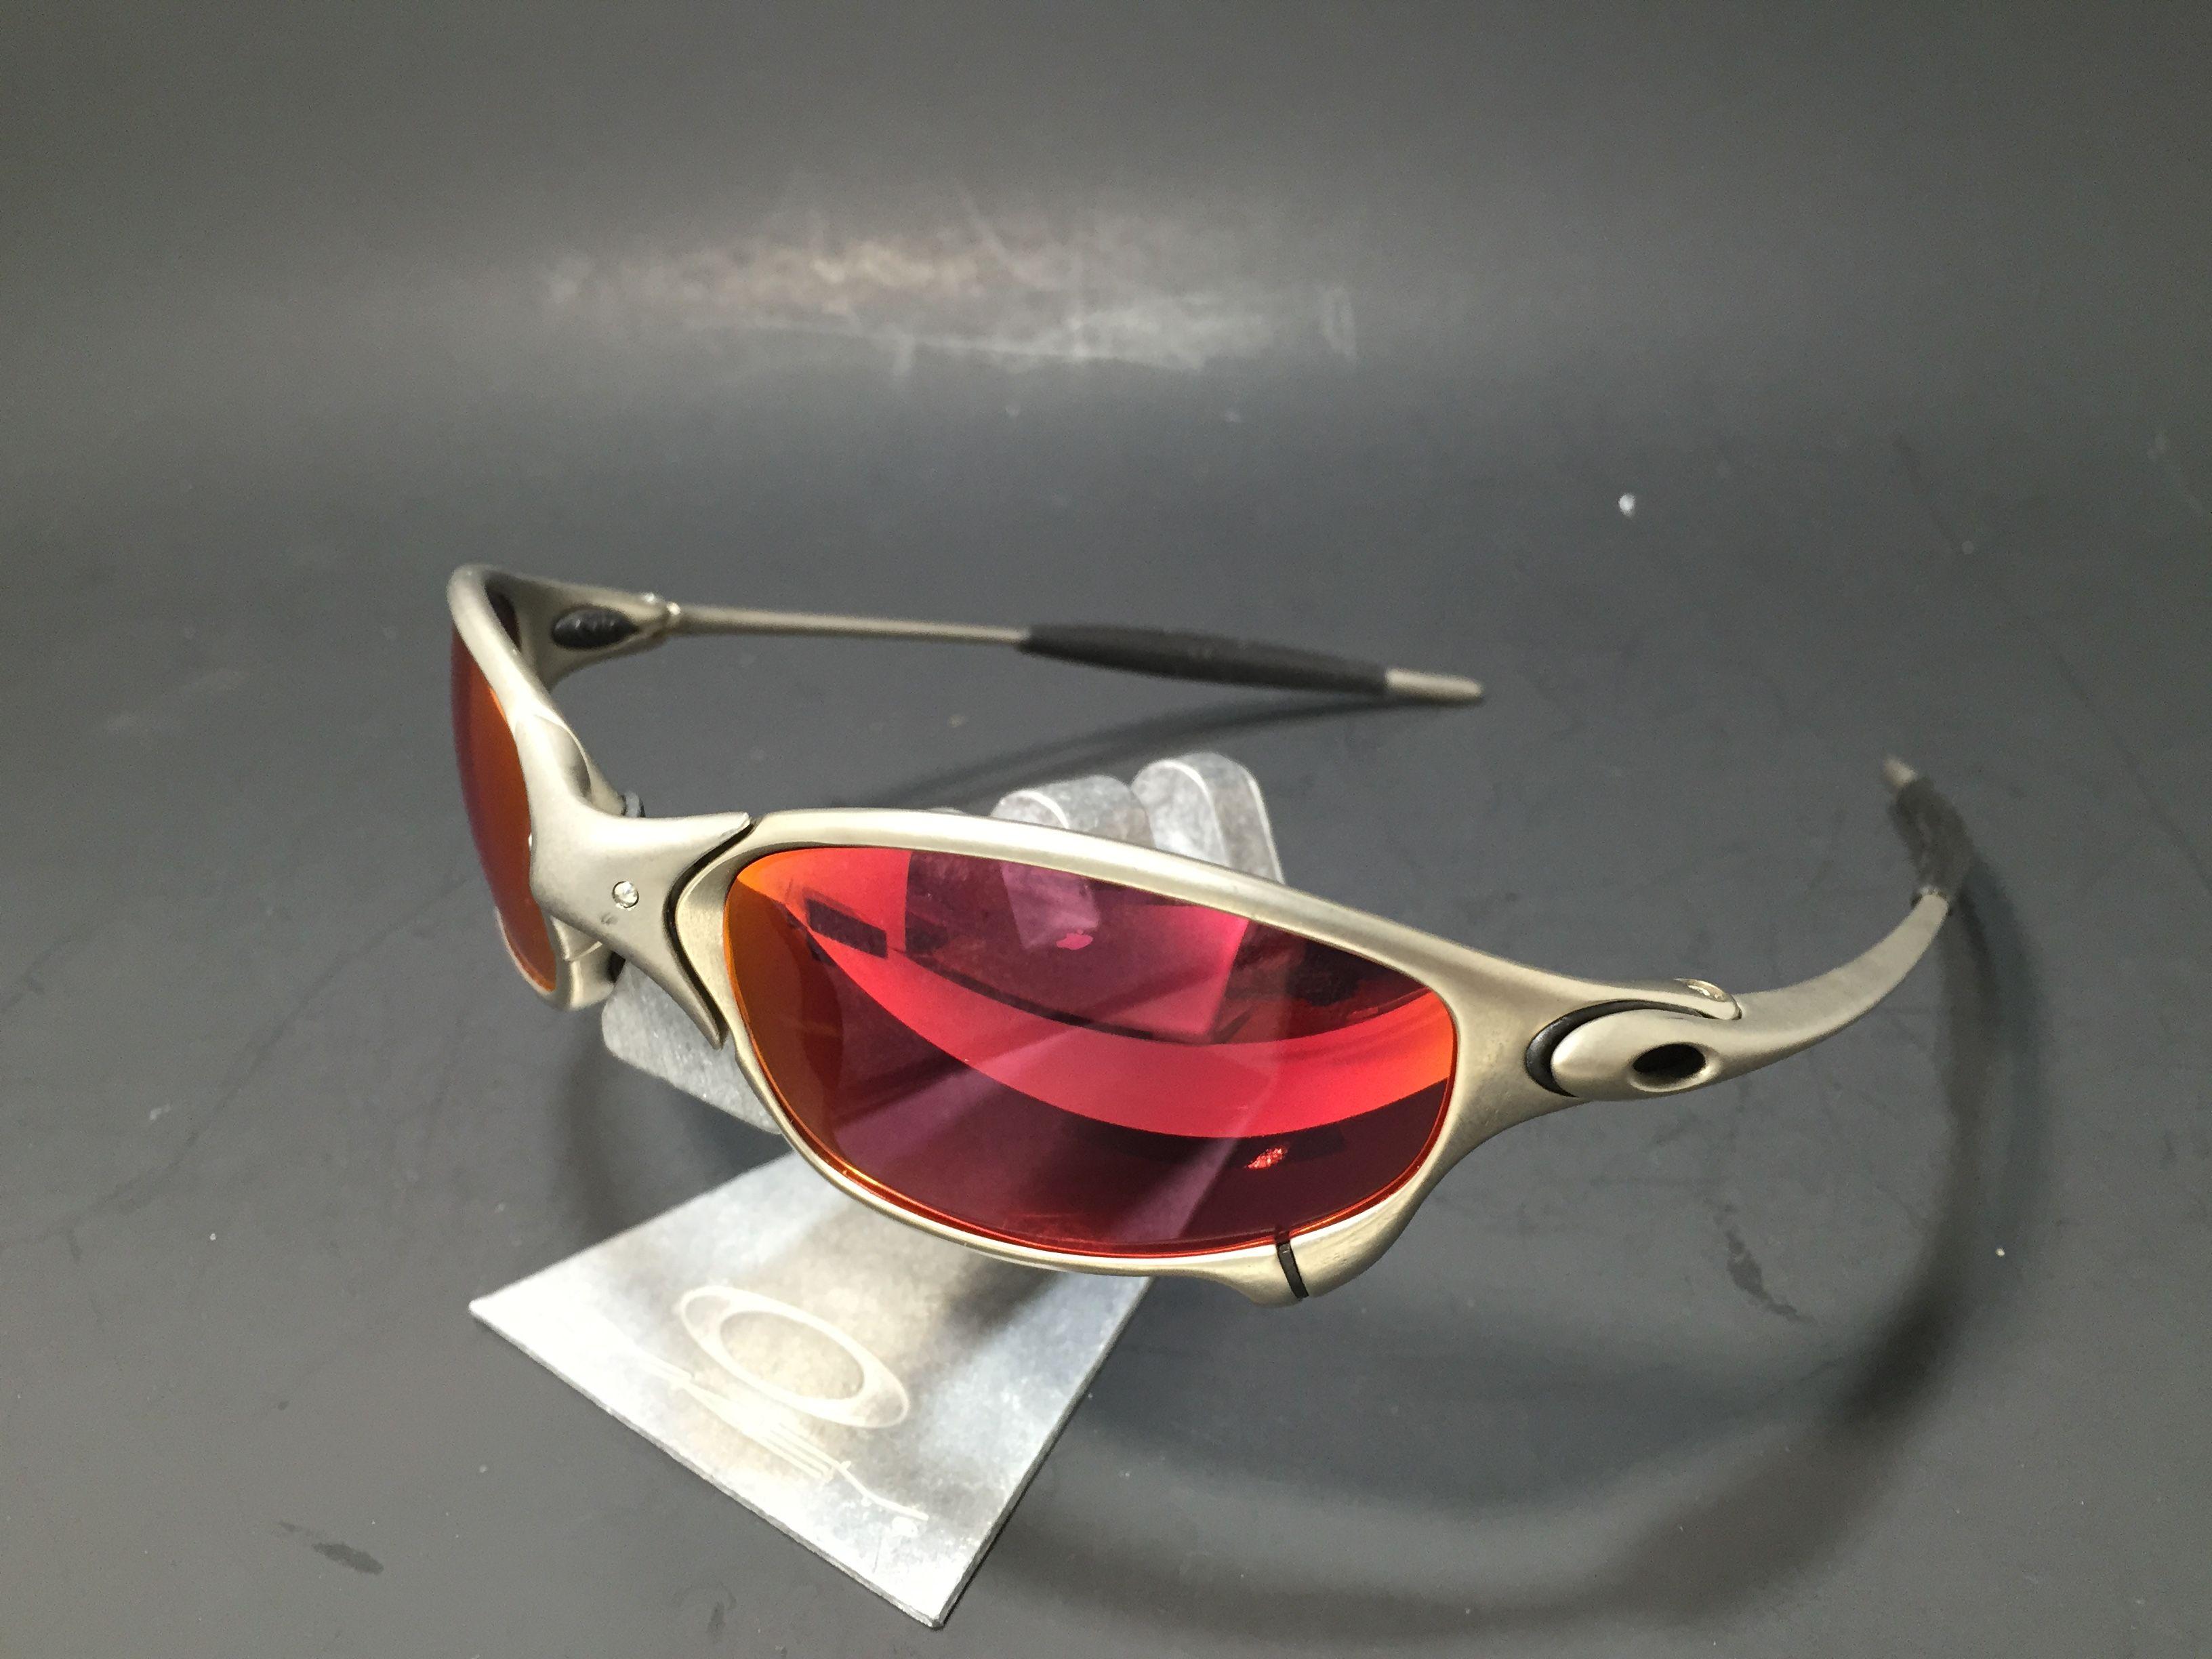 9e3f09bf3 Modelos De Óculos, Oculos Juliet, Oculos Vermelho, Óculos Masculino, Oculos  De Sol